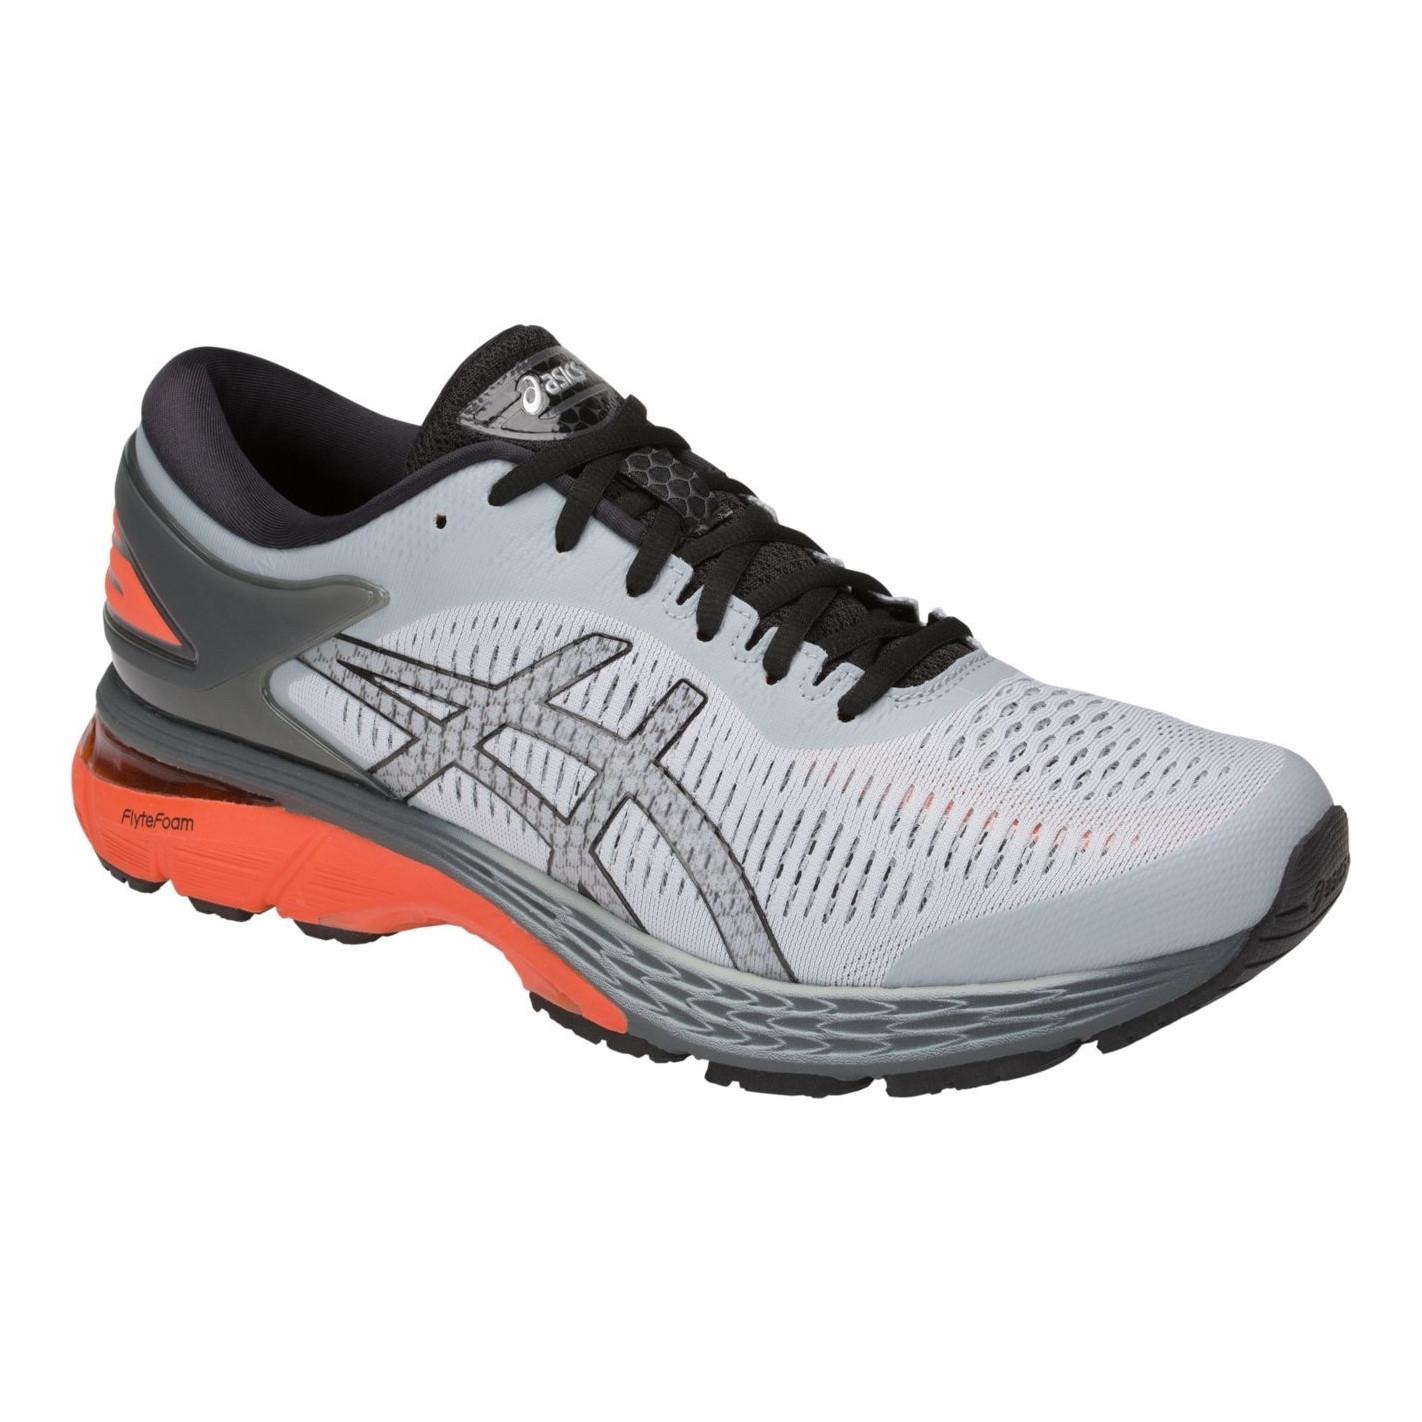 Chaussures Running ASICS Homme GEL-KAYANO 25 Grise / Orange AH ...